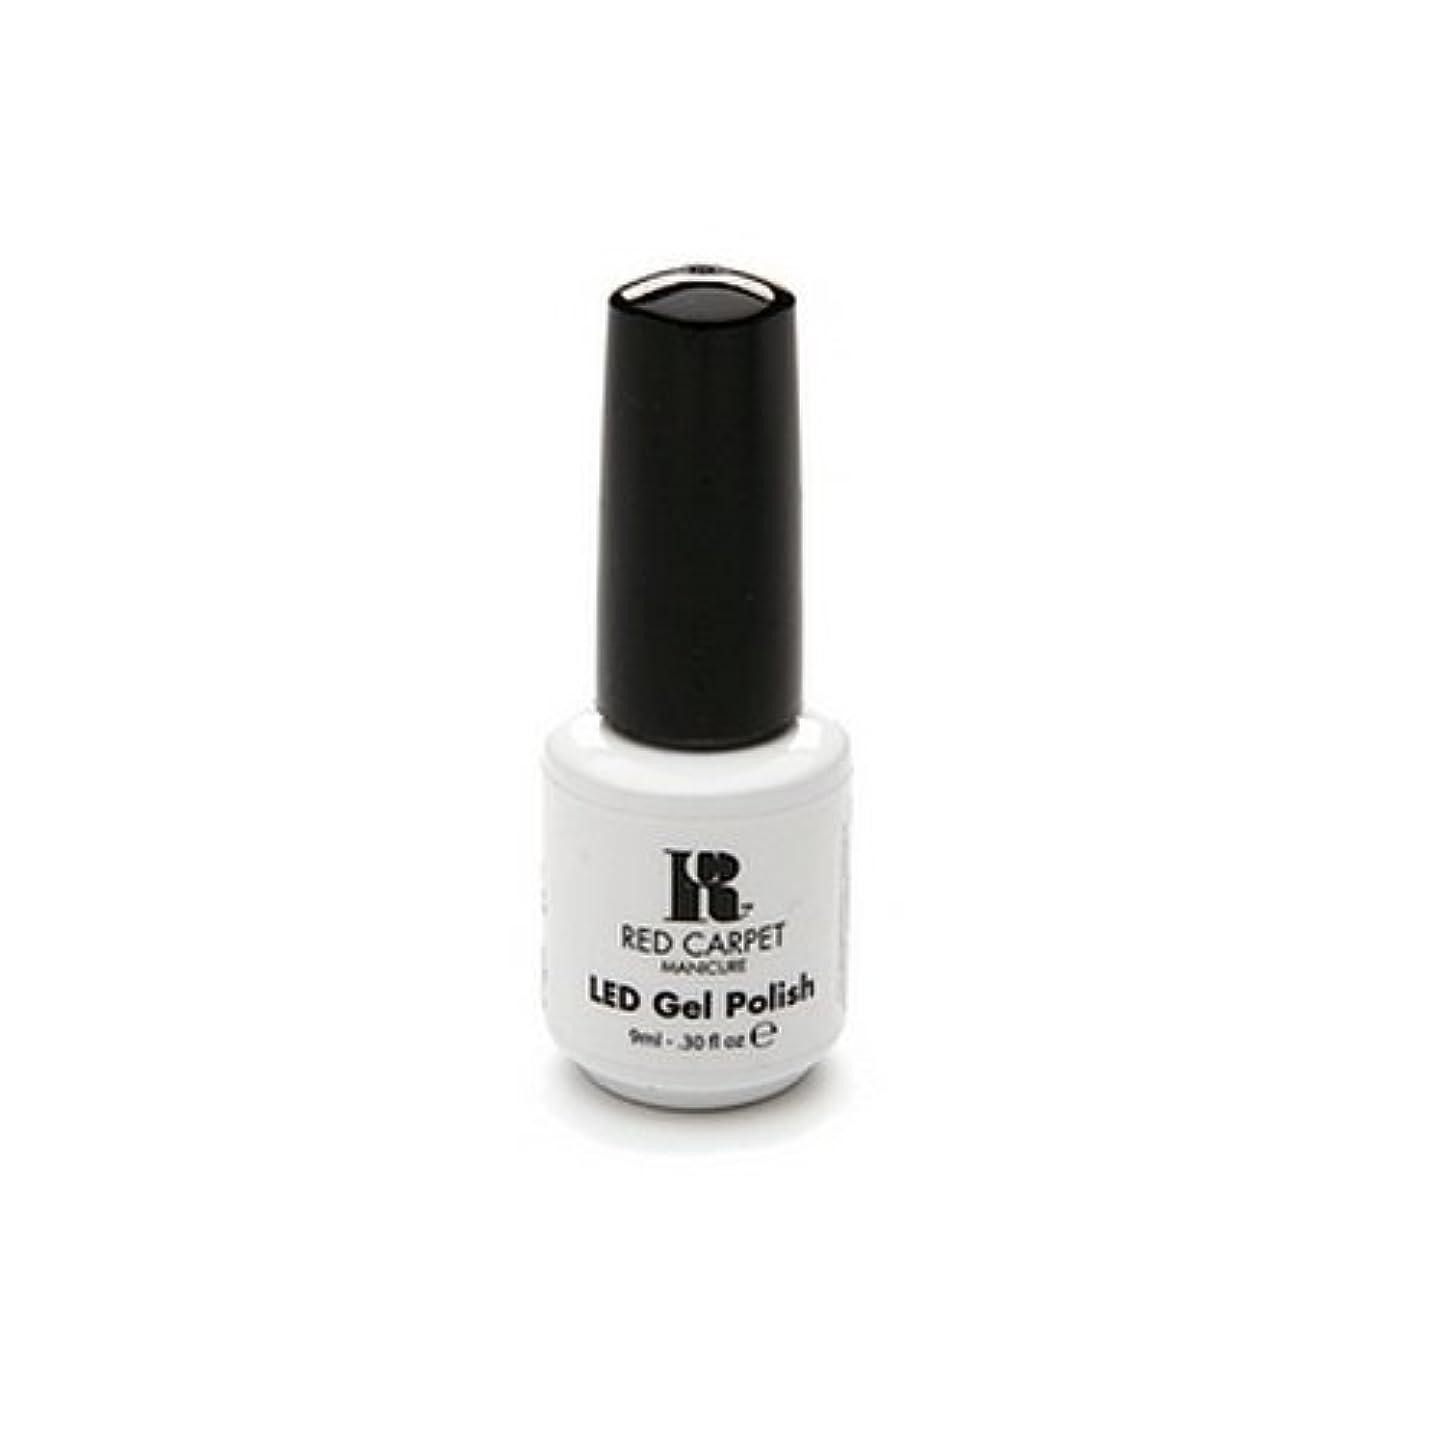 Red Carpet Manicure - LED Nail Gel Polish - Iconic Beauty - 0.3oz / 9ml